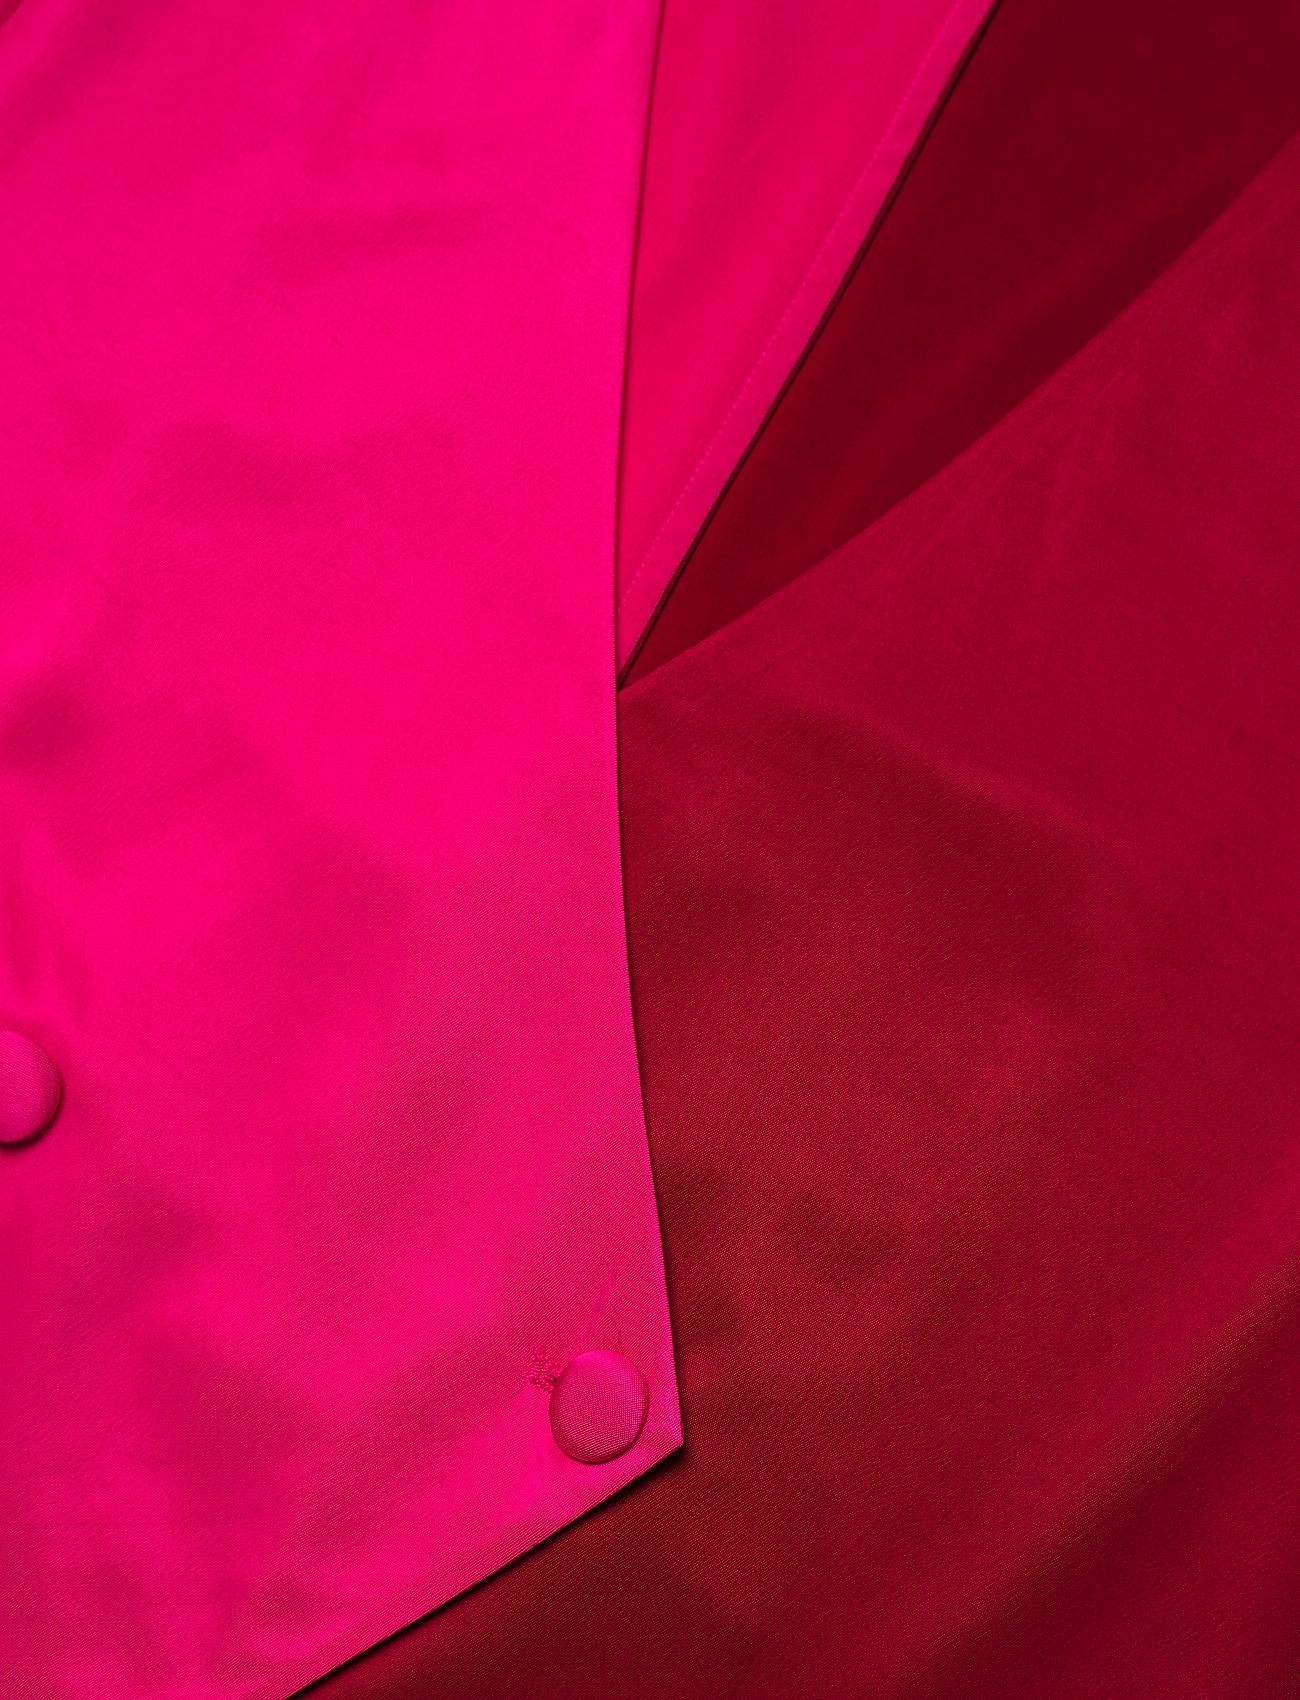 Gestuz Sylviagz Shirt Ao19 - Blusar & Skjortor Rooibos Tea